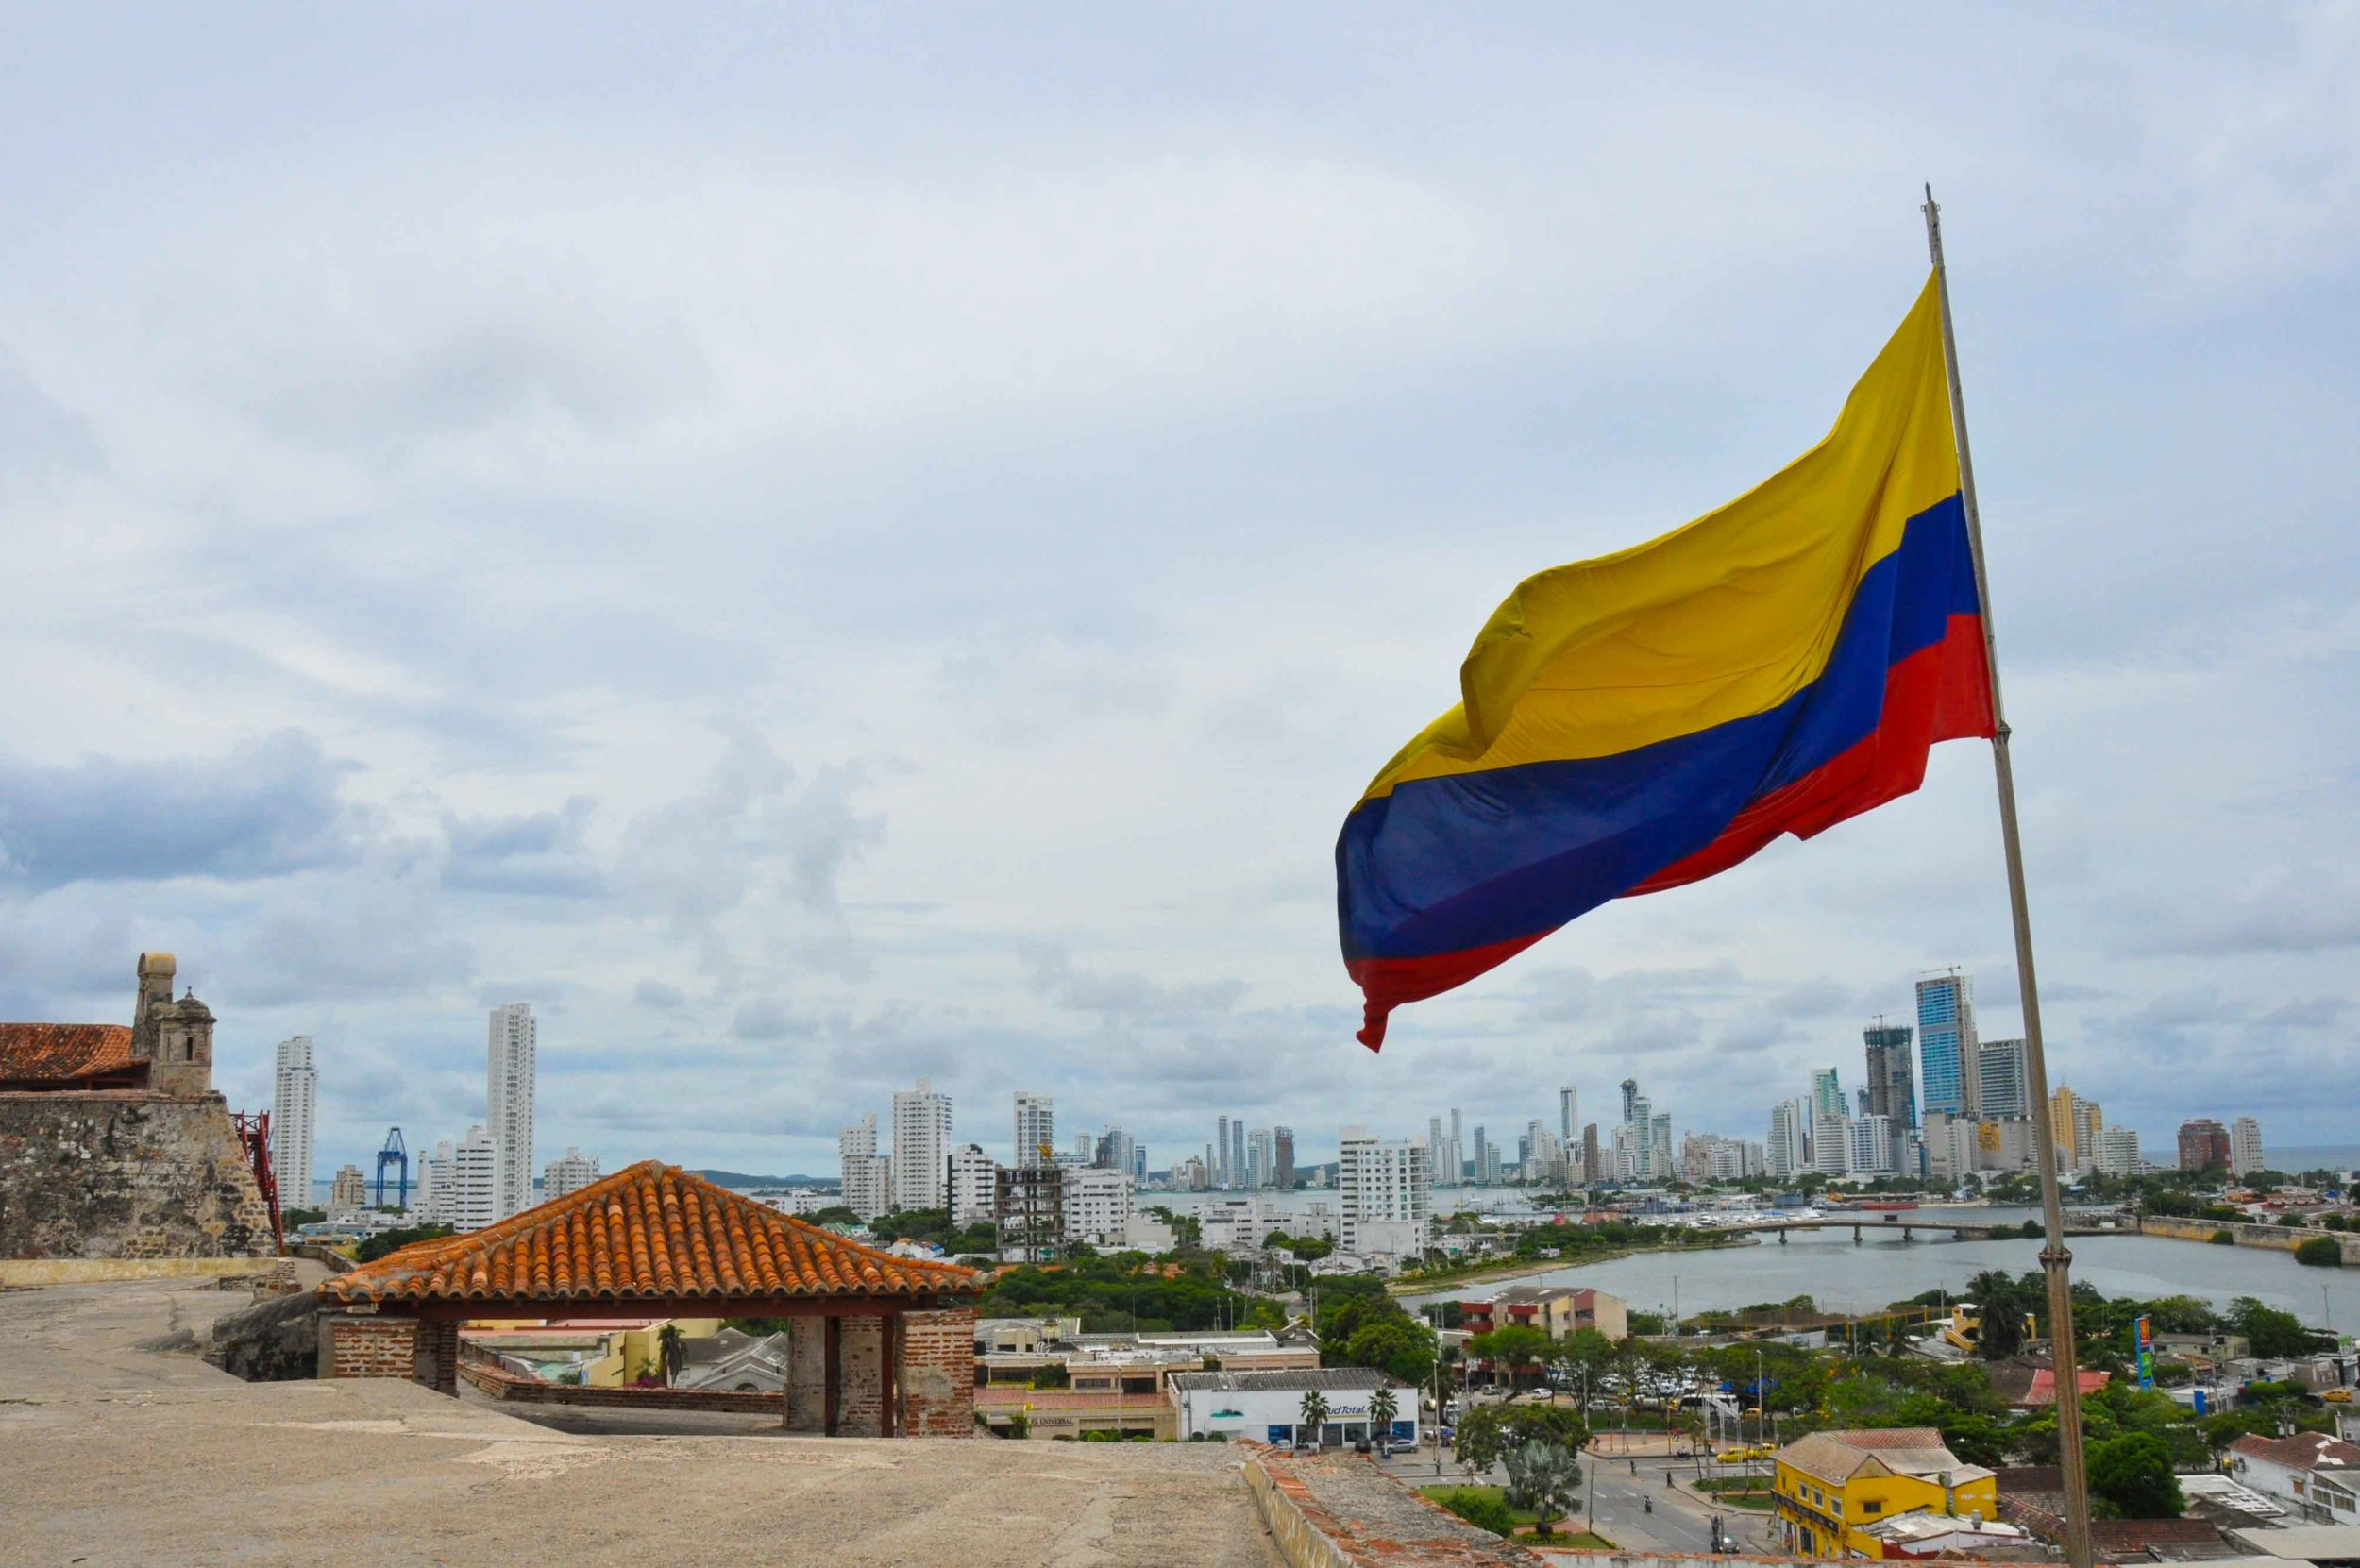 2015_10_Cartagena_s-22.jpg